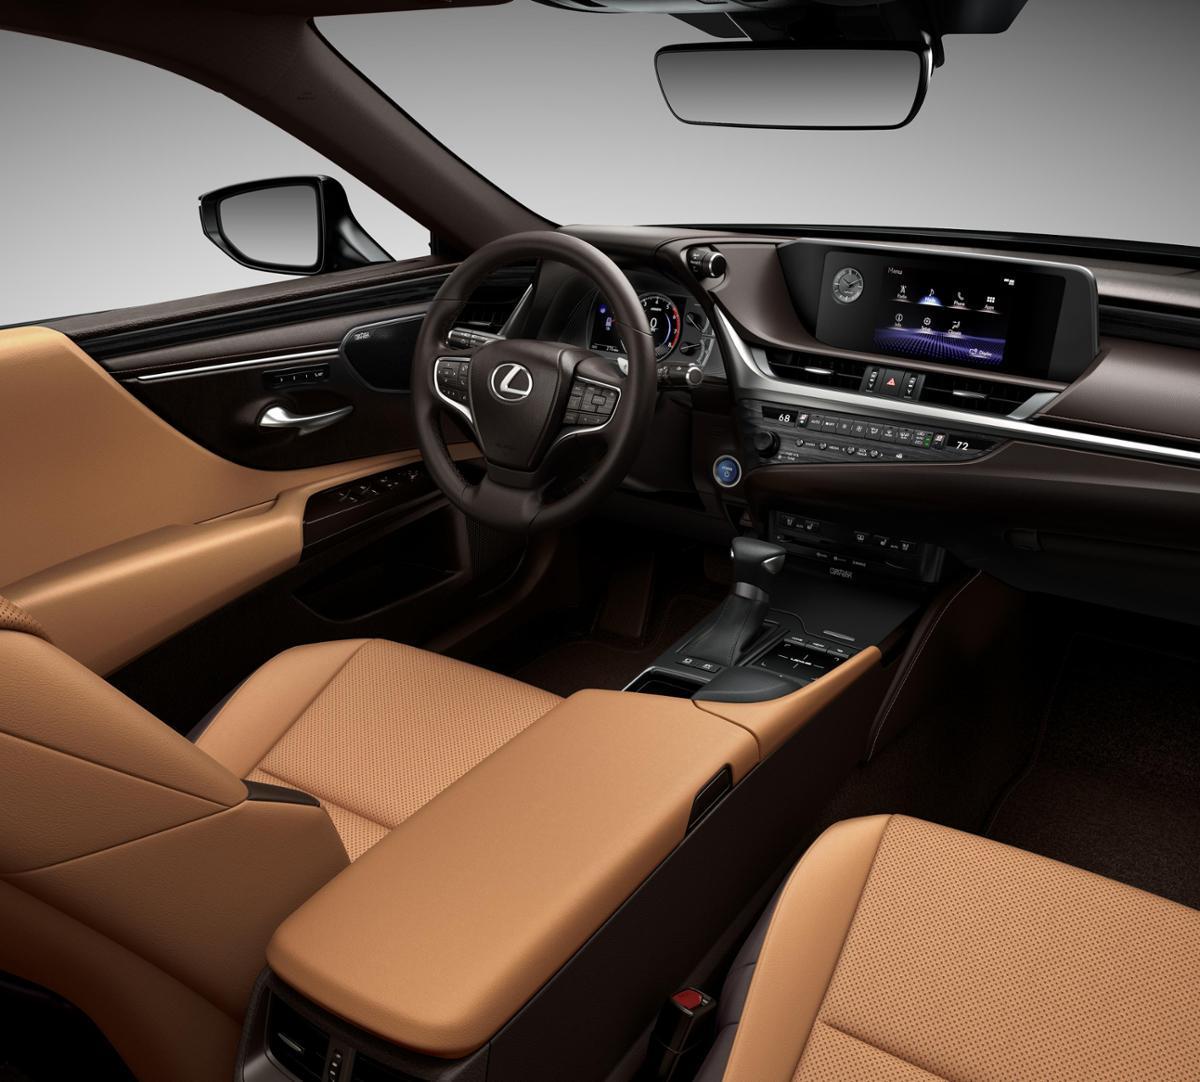 2019 Lexus ES 300h For Sale In Pembroke Pines